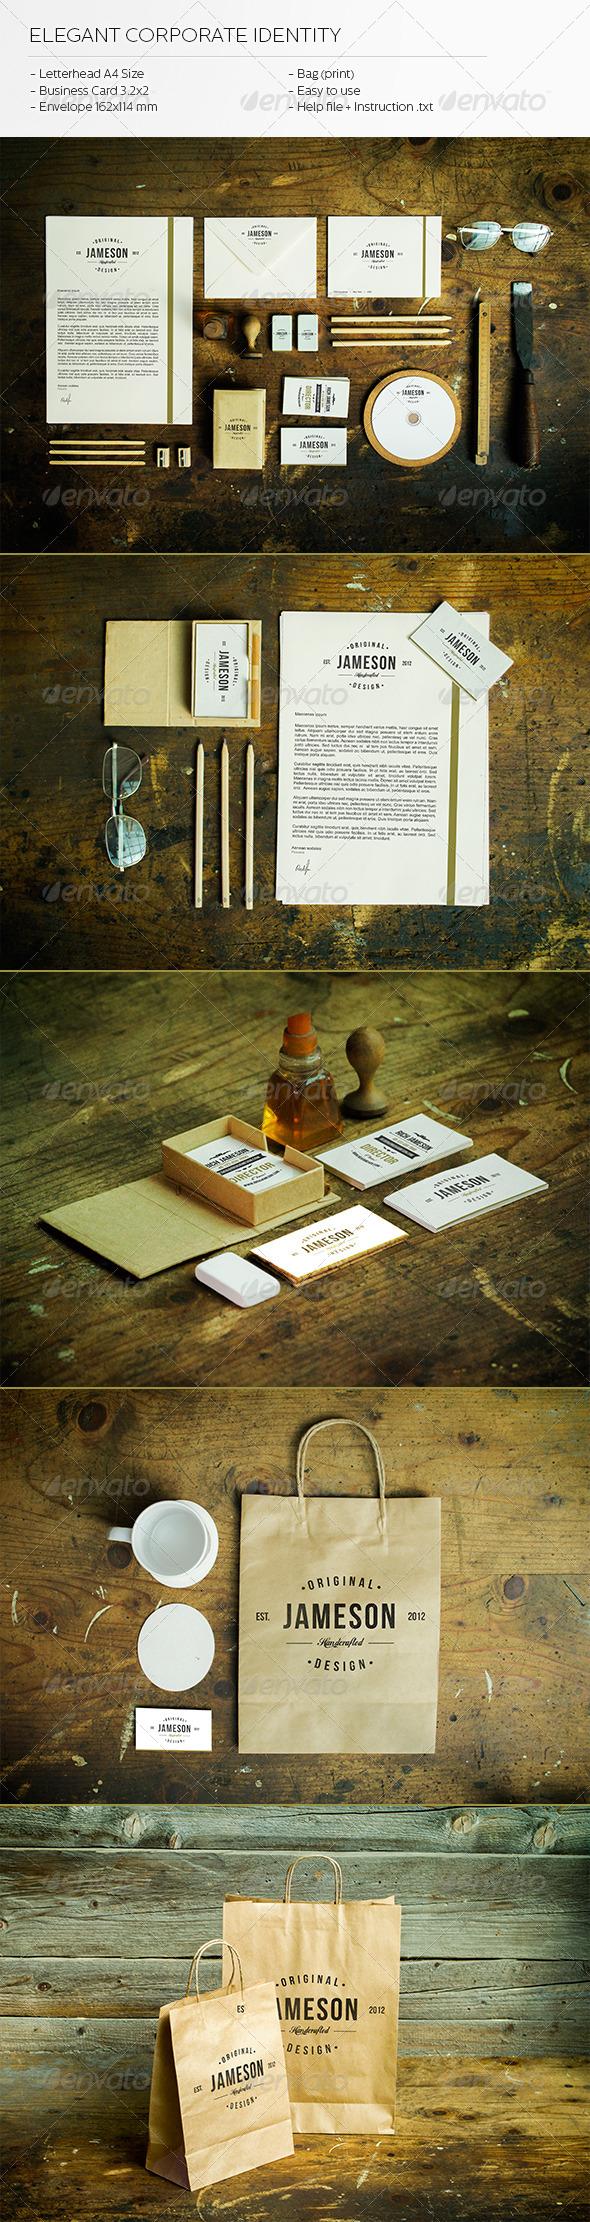 GraphicRiver Elegant Corporate Identity 5921961